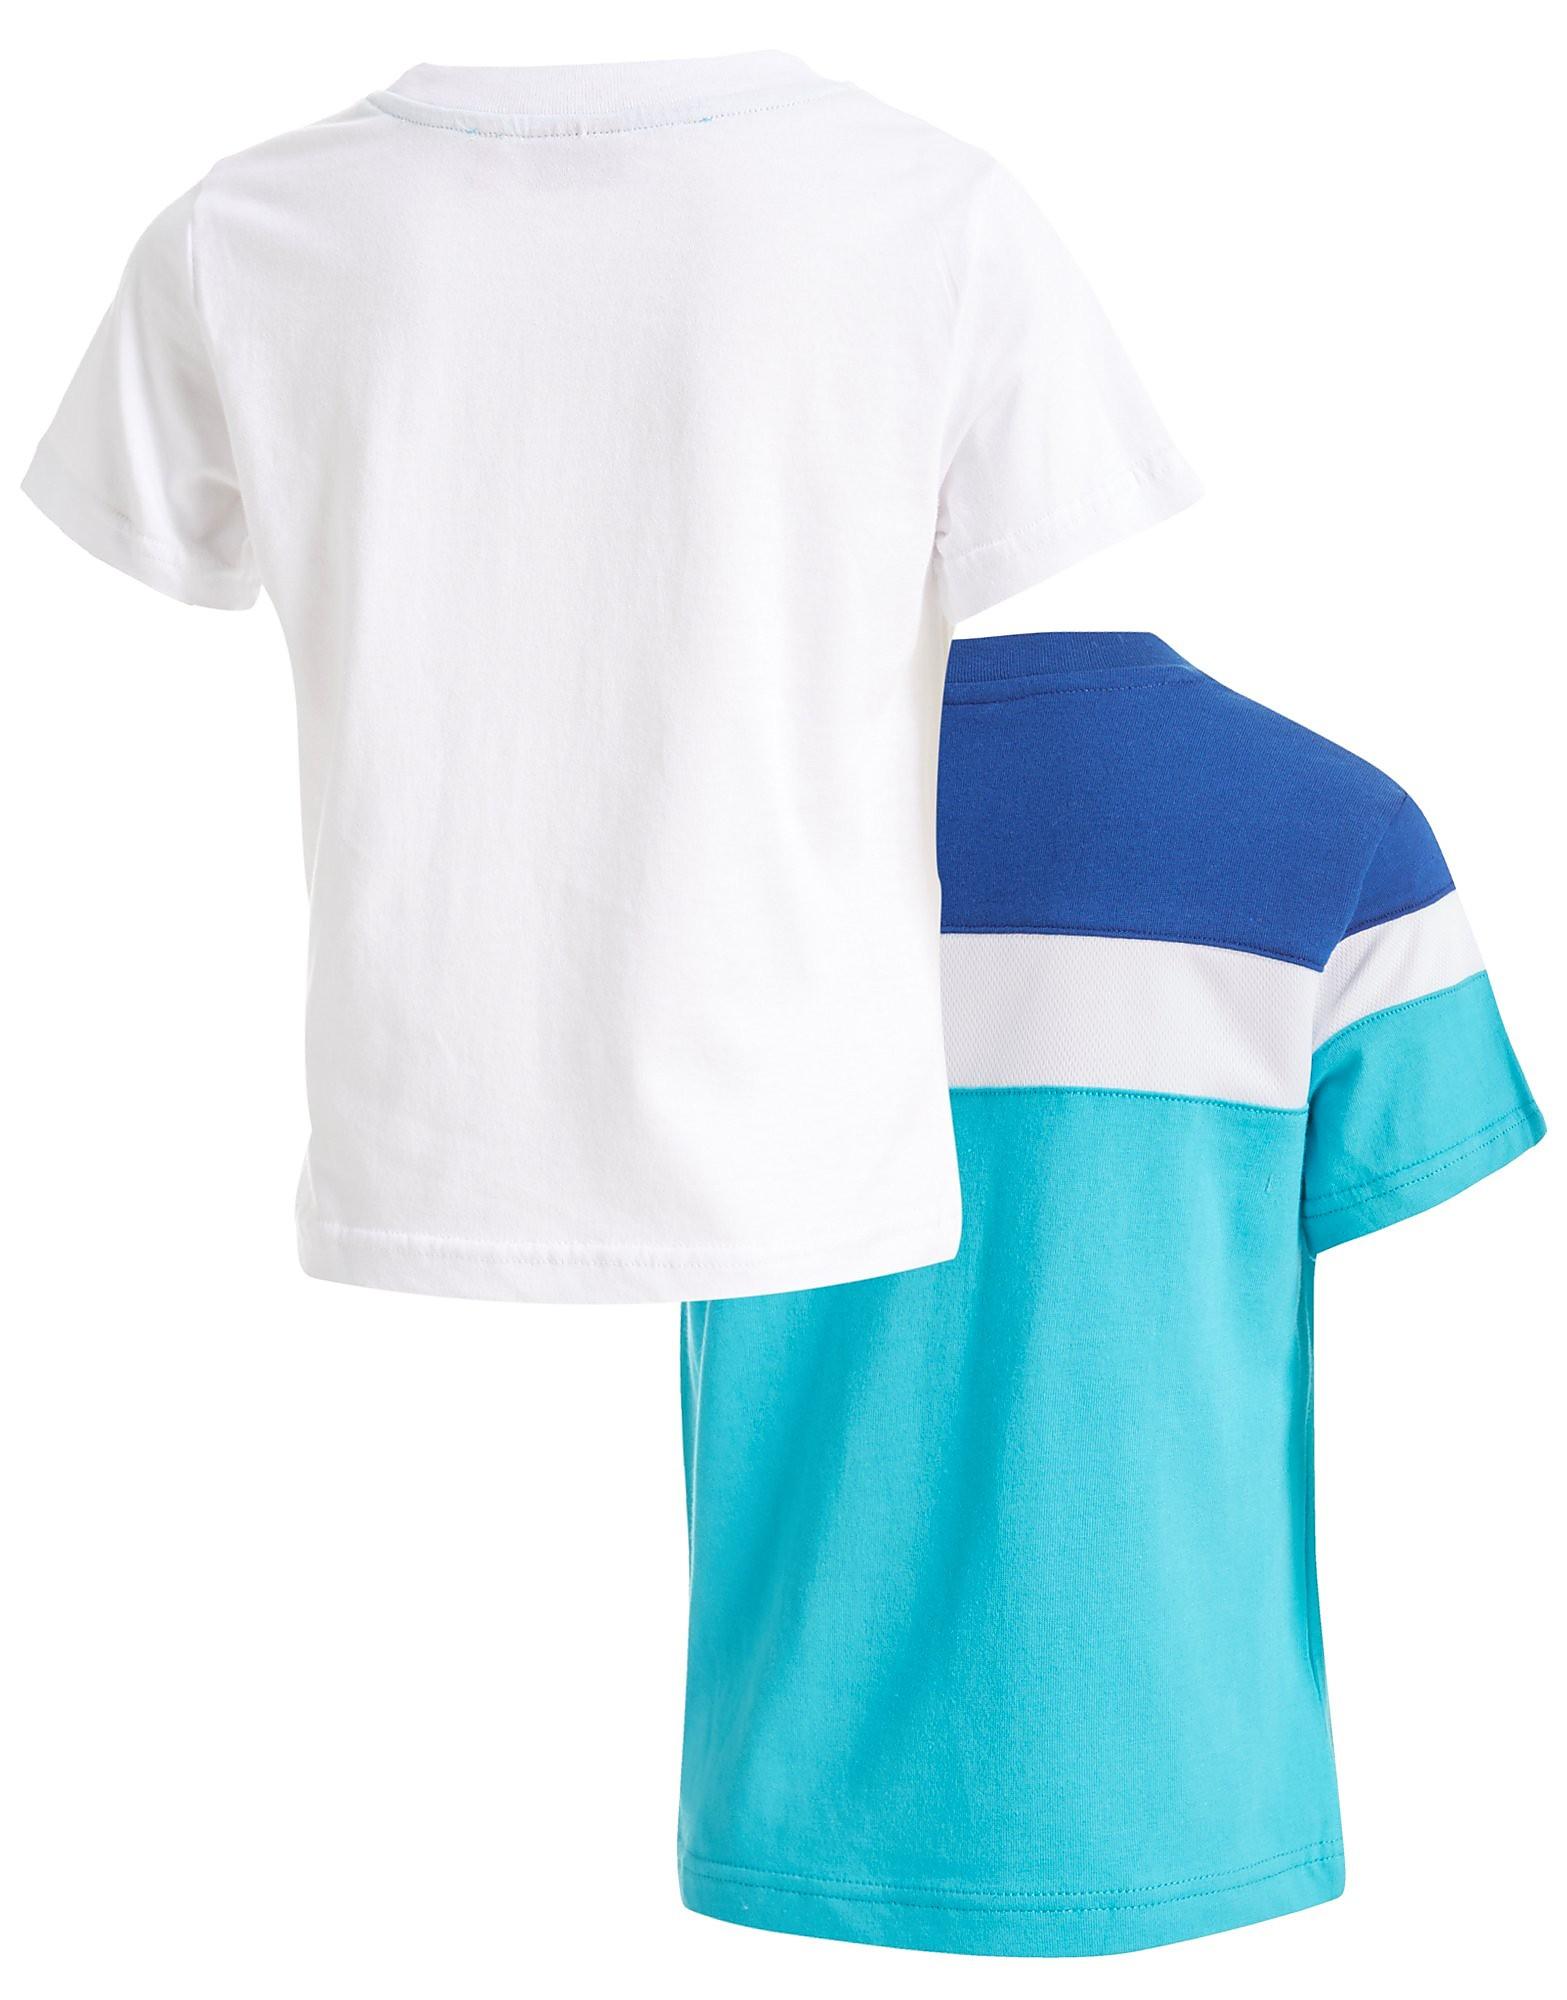 McKenzie Mini Hanson 2 Pack T-Shirt Children